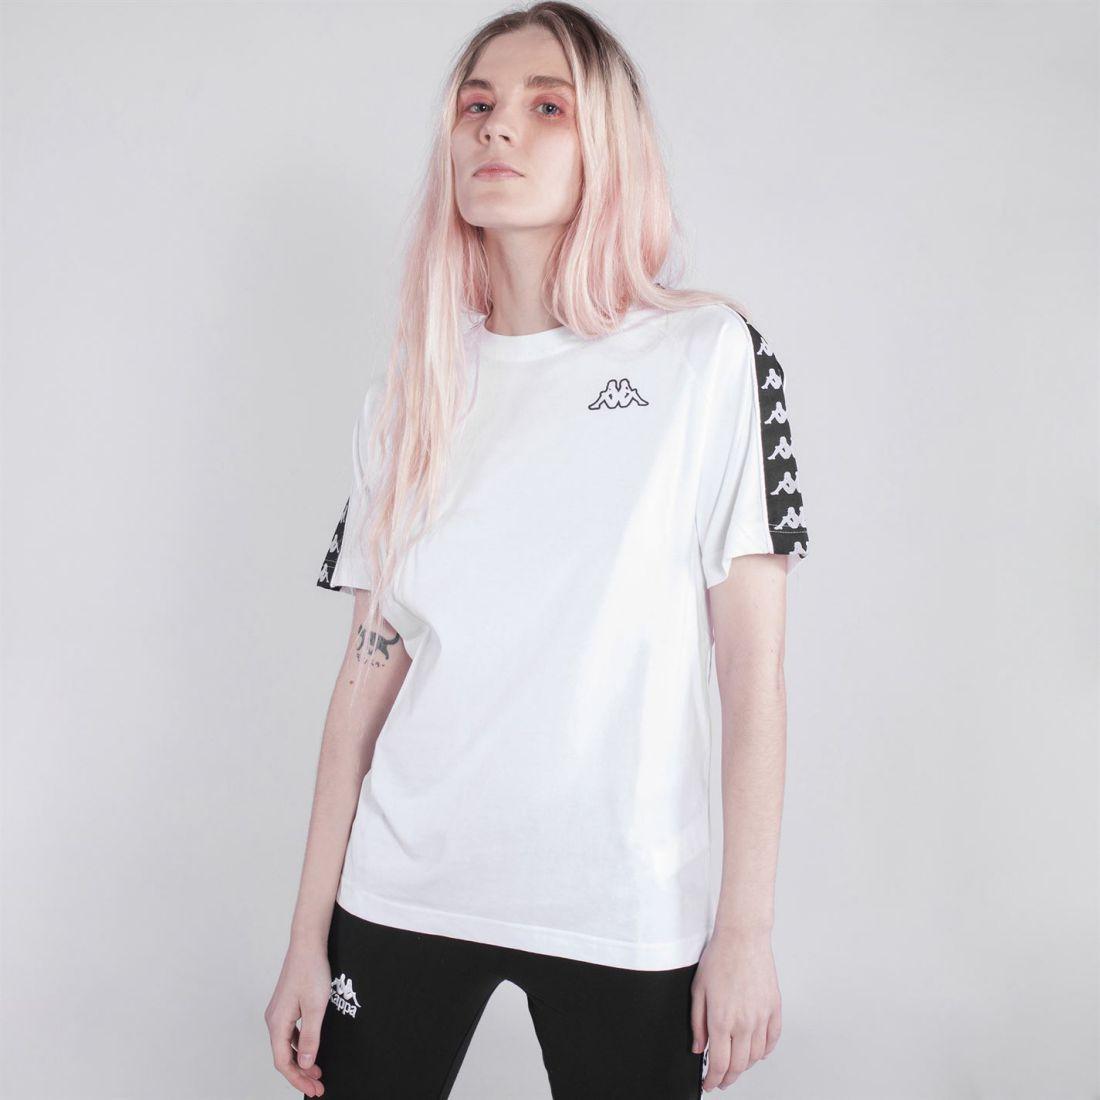 ce40b0d8 Details about Womens Kappa Banda Coen Slim T Shirt Crew Neck Short Sleeve  New